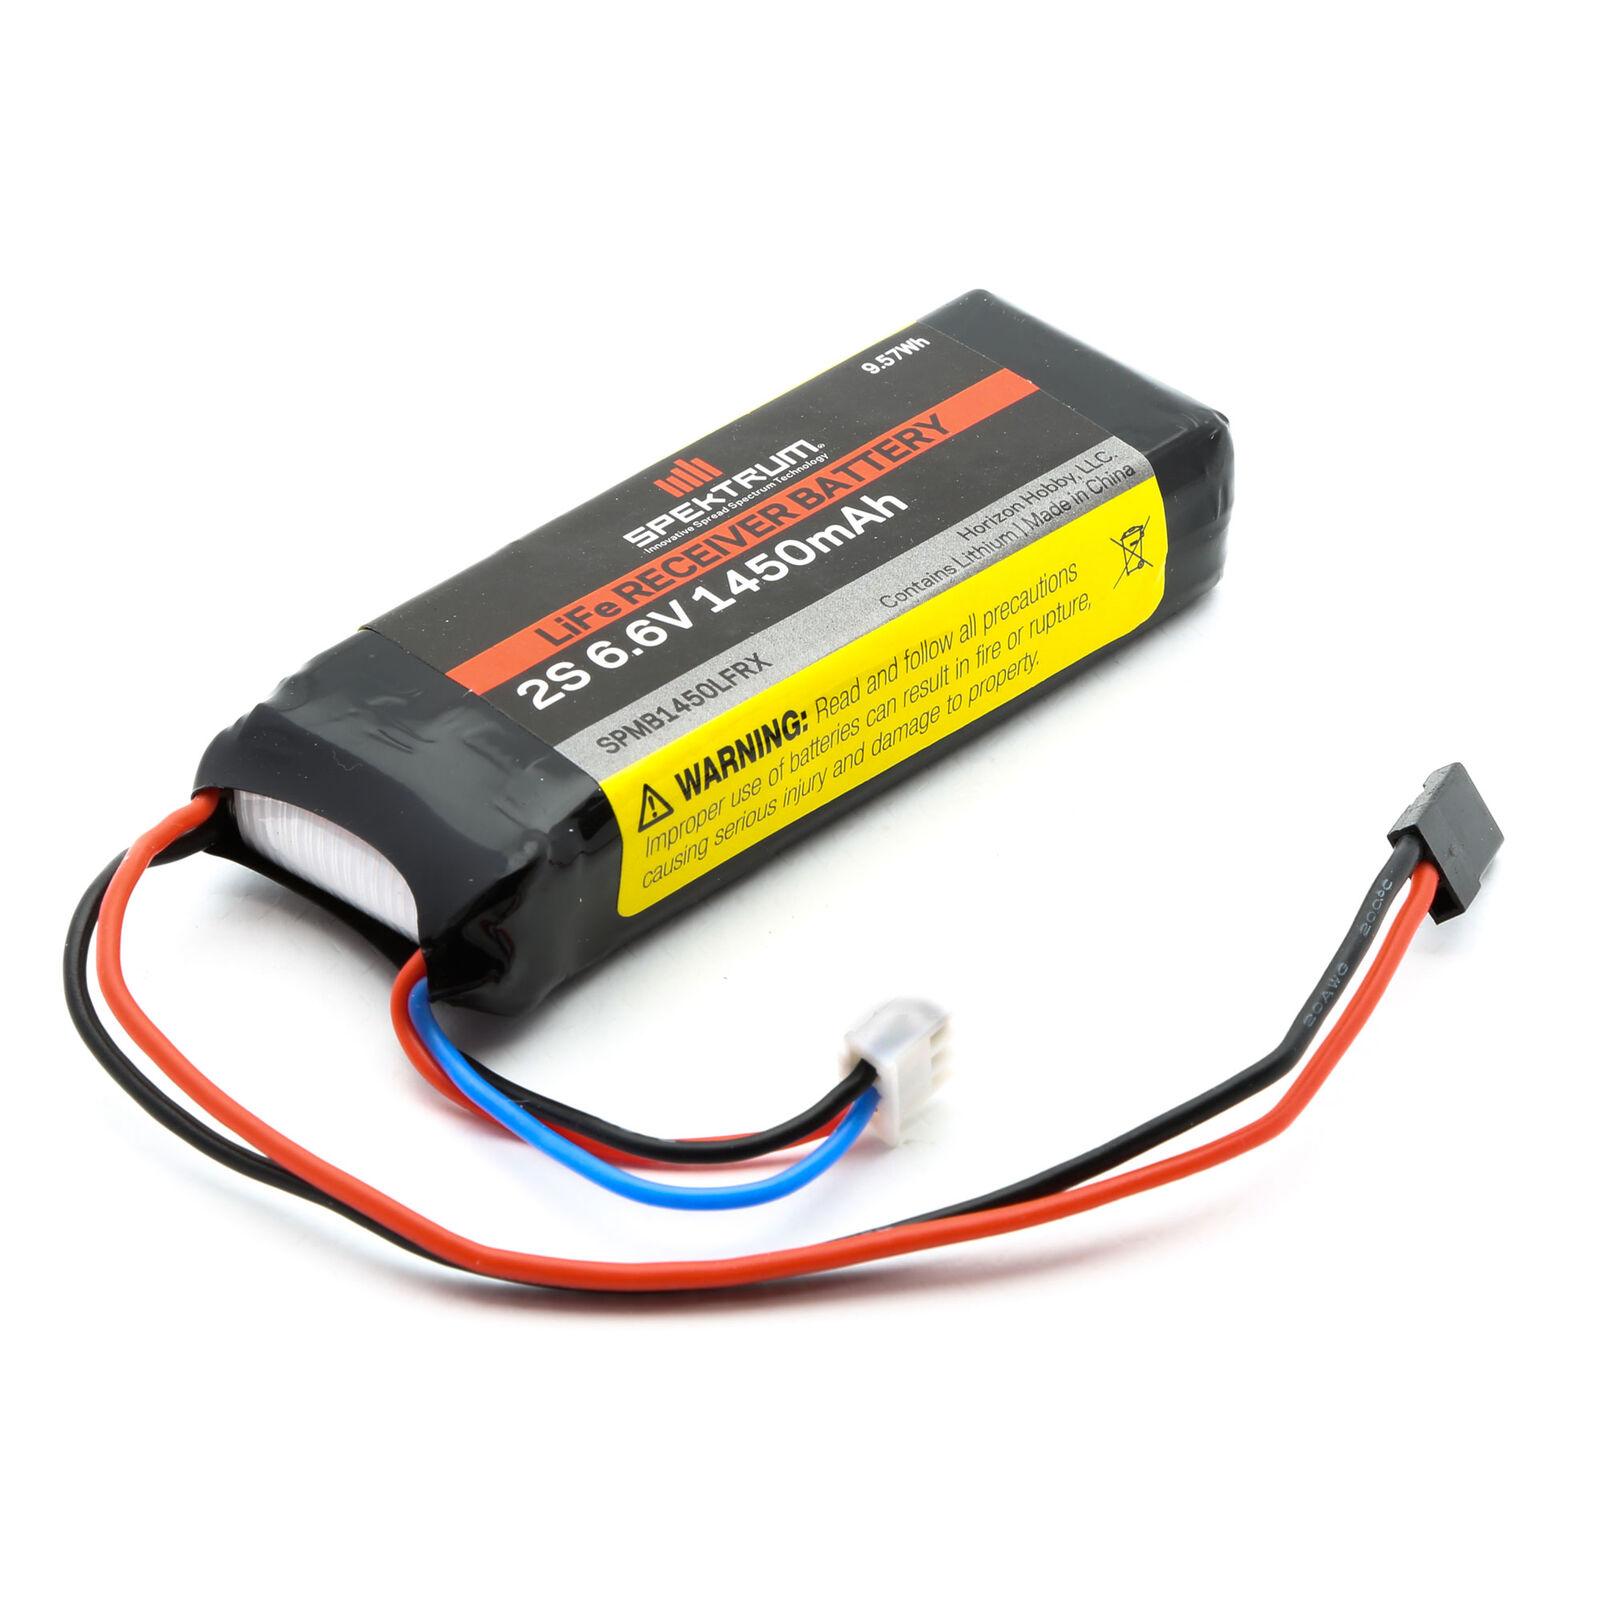 6.6V 1450mAh 2S LiFe Receiver Battery: Universal Receiver